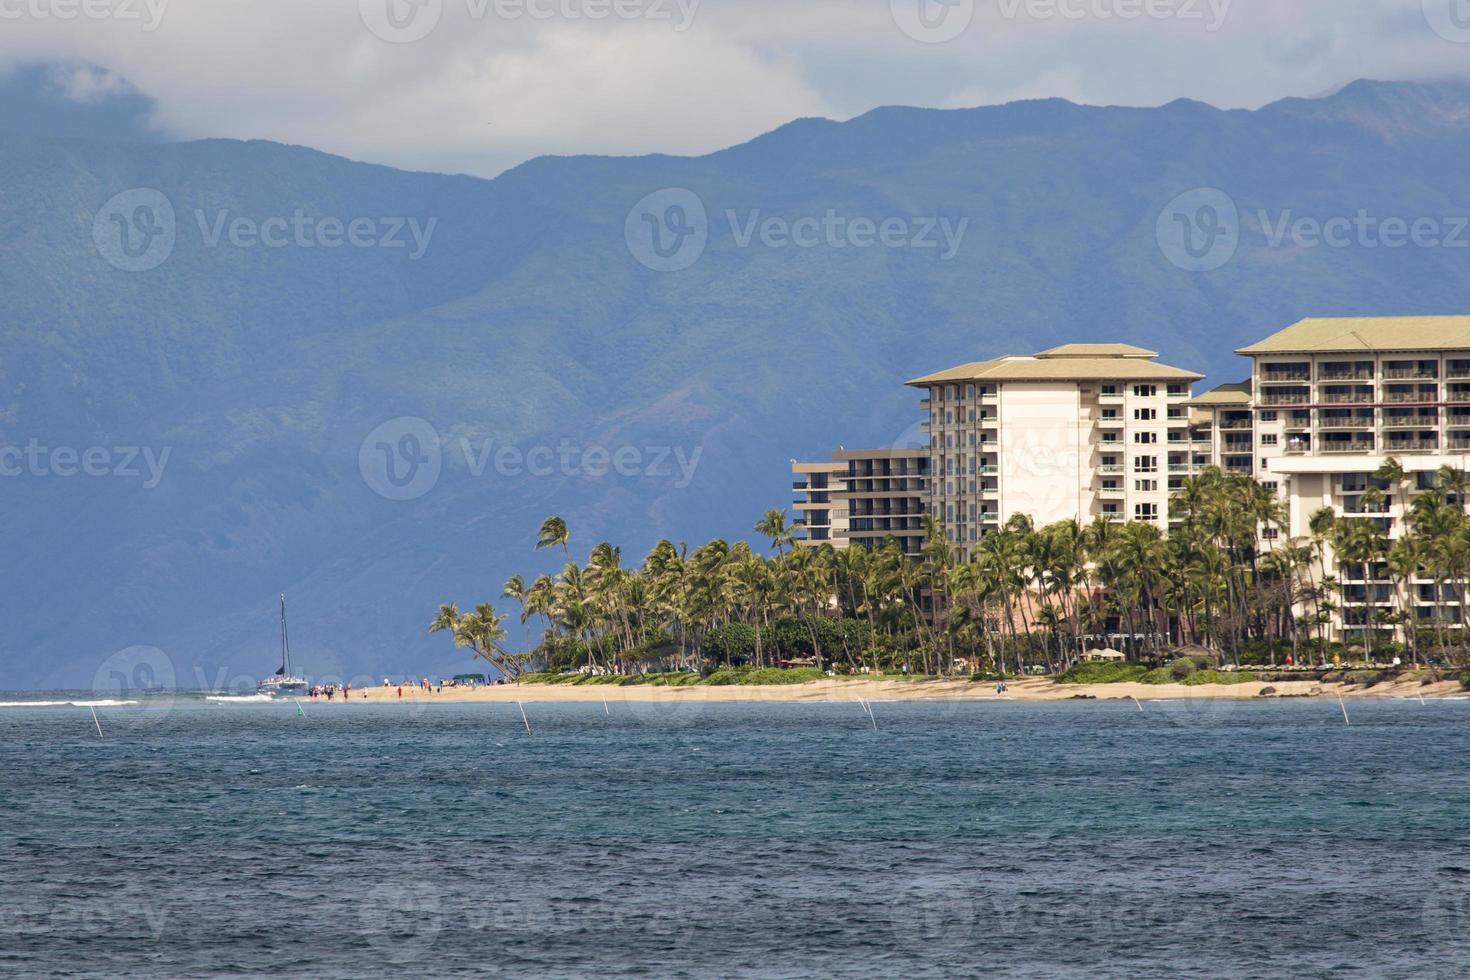 kaanapali beach, maui hawaii turistmål foto